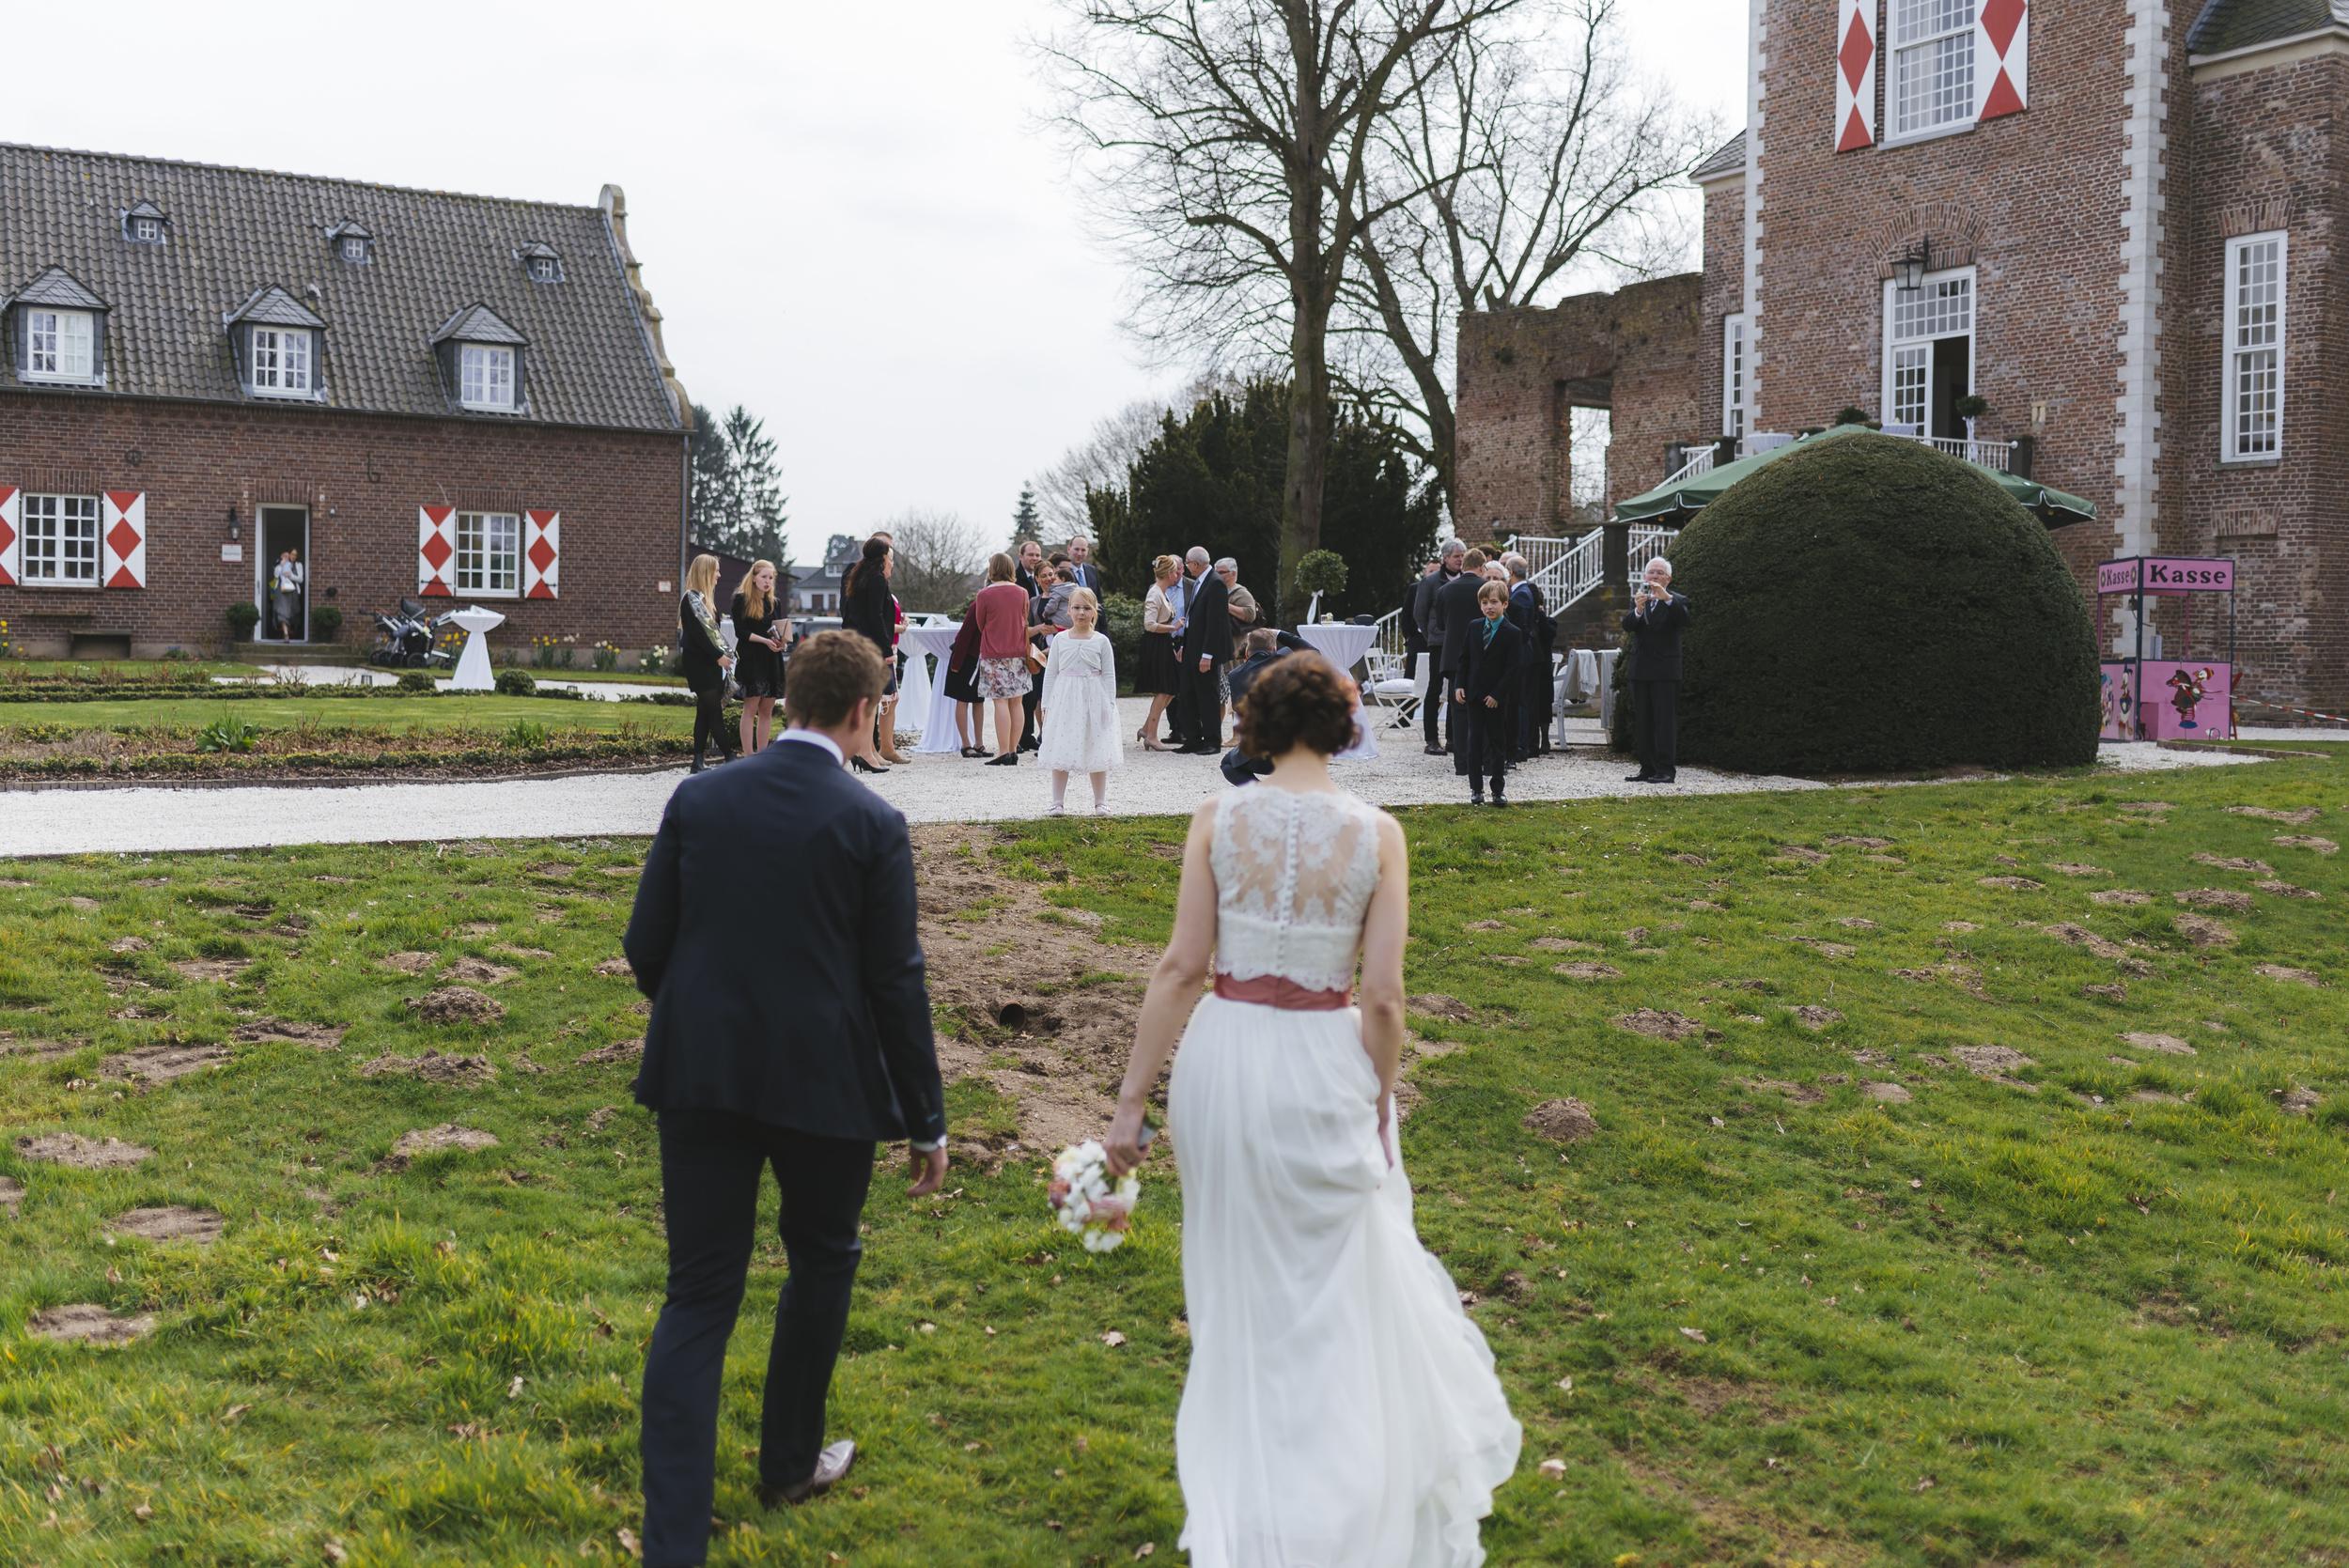 Hochzeitsfotograf-Schlossruine-Hertefeld-Weeze-046.jpg